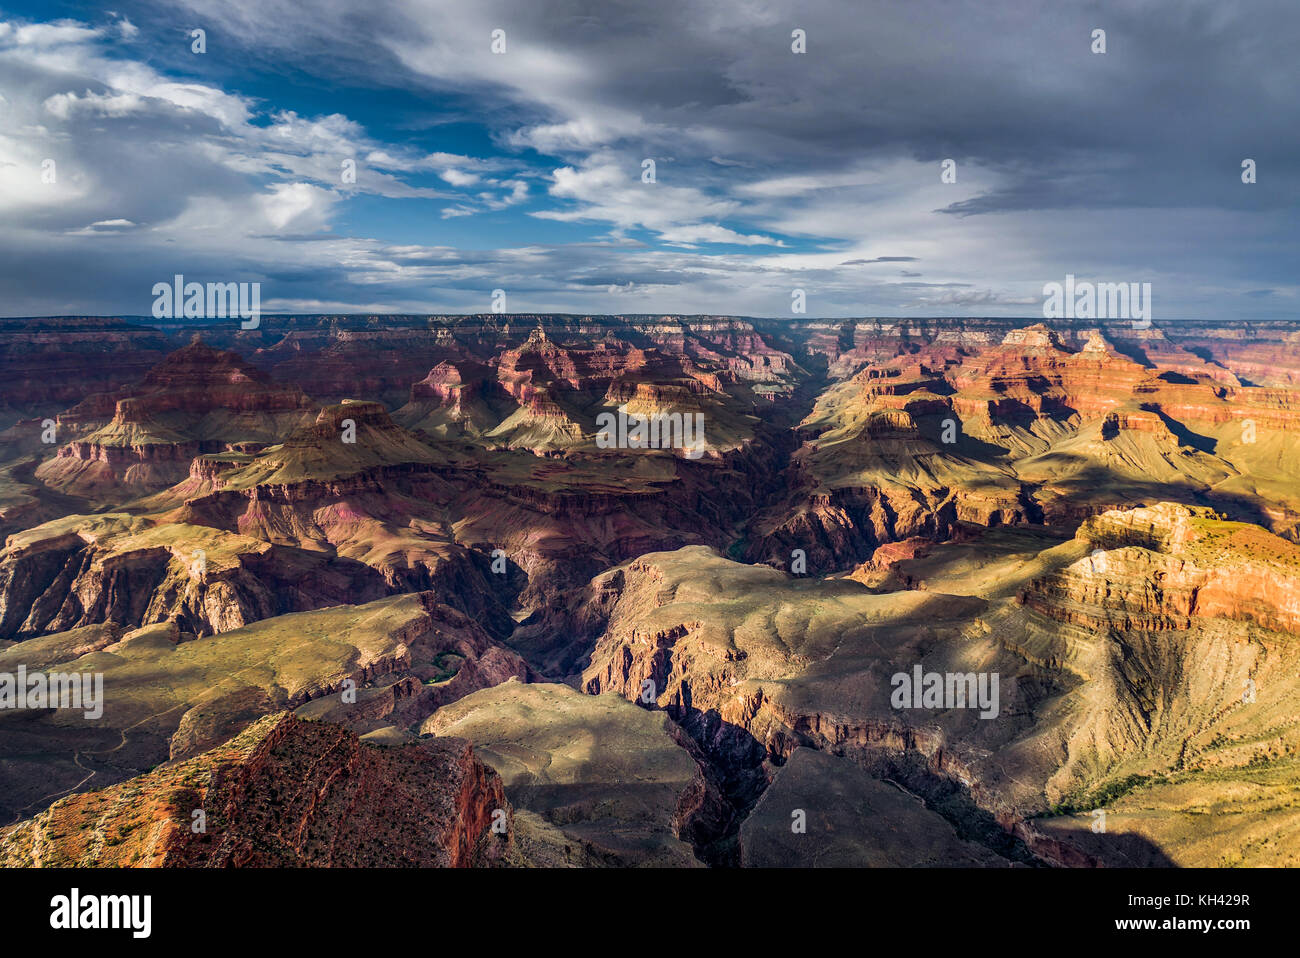 View across Grand Canyon South Rim Arizona - Stock Image